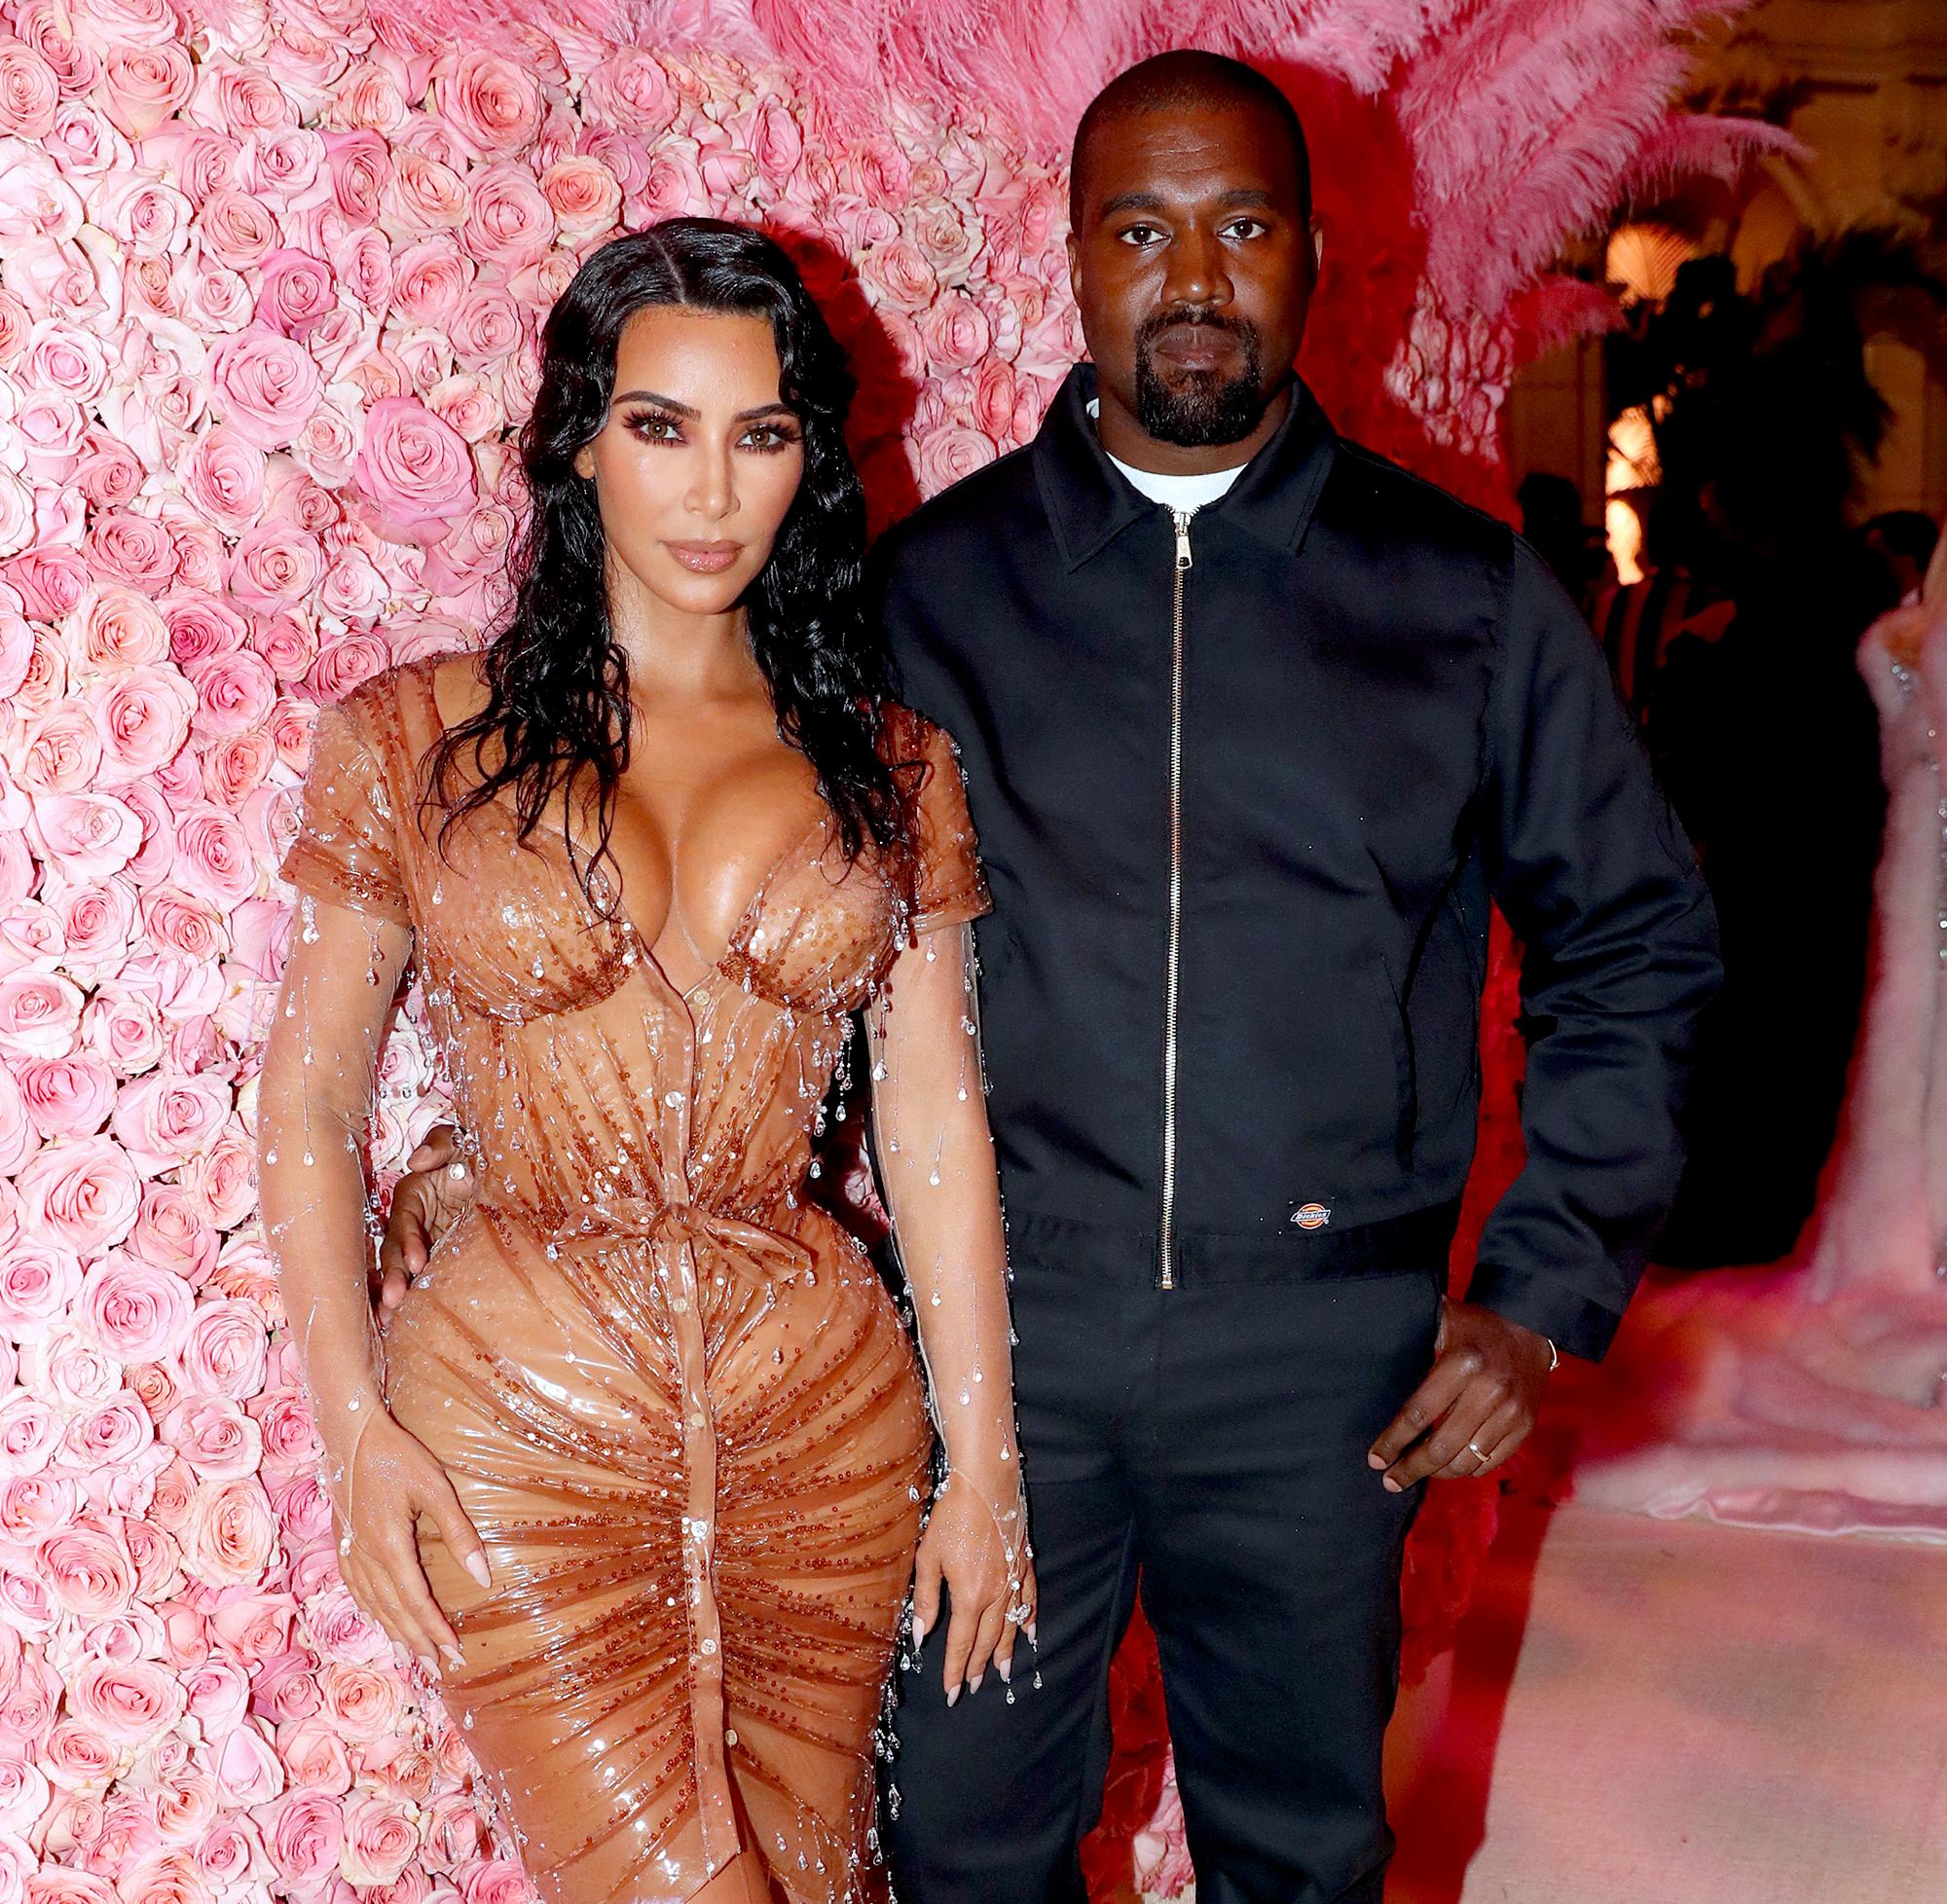 Kim-Kardashian-and-Kanye-West-Son-Psalm's-Name